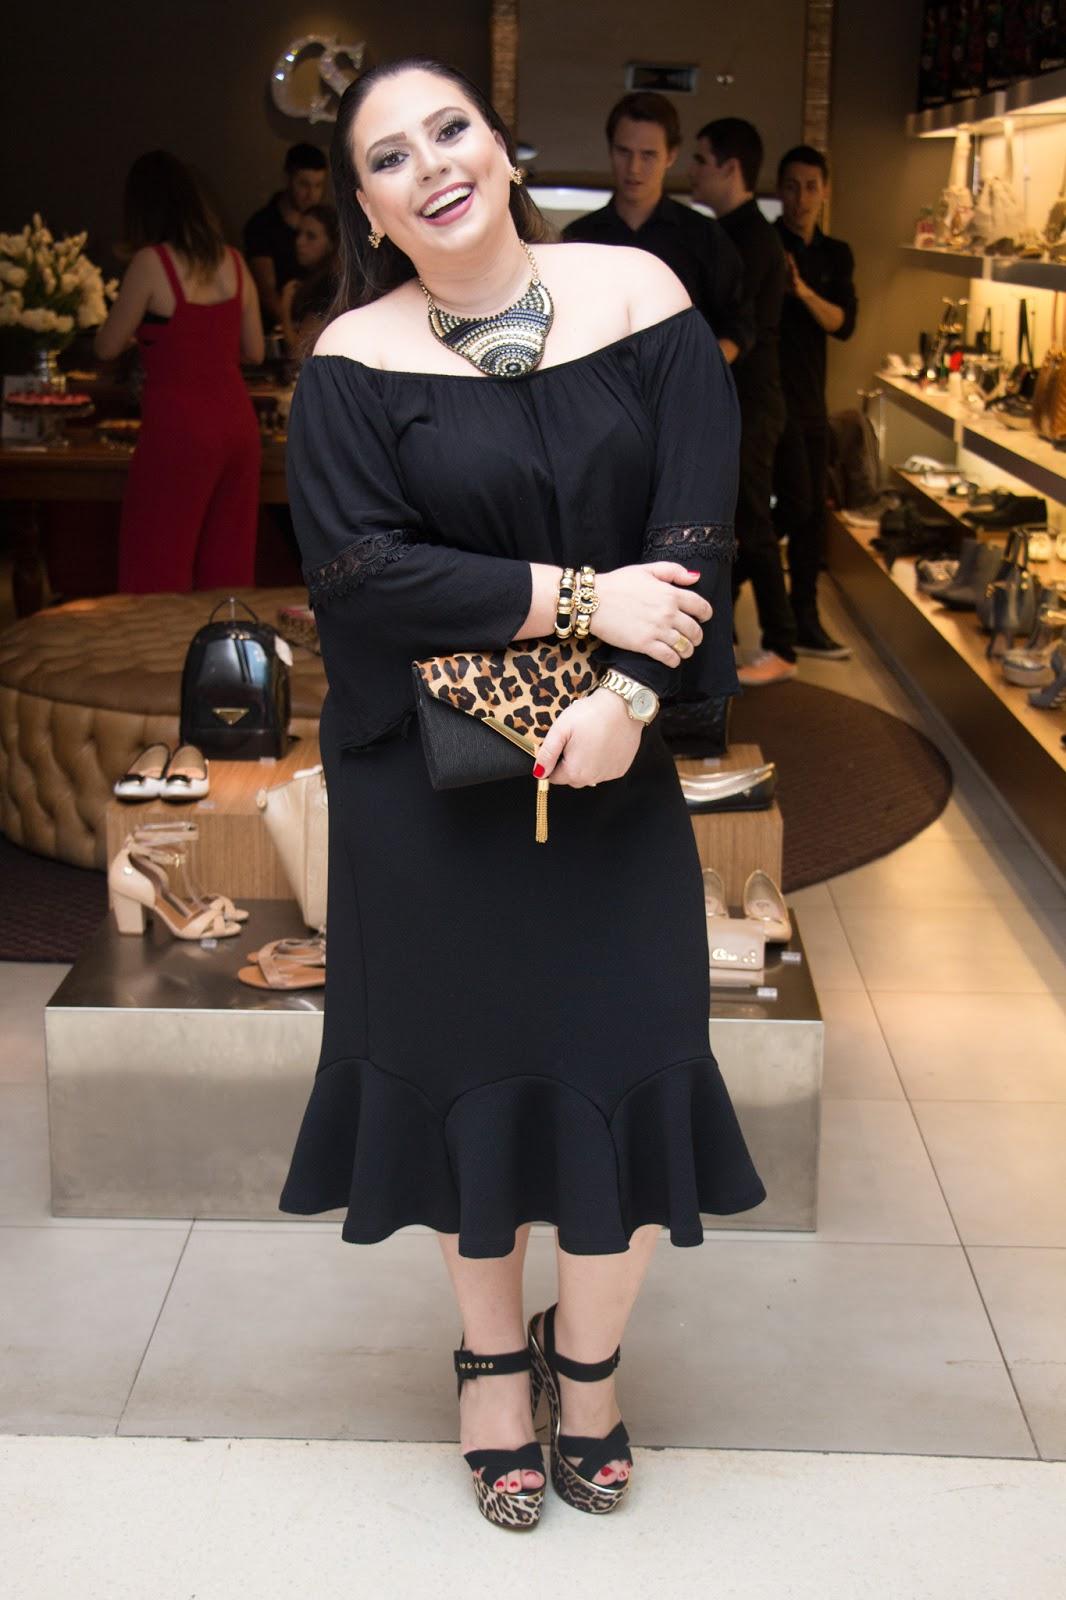 62a244787c Blog Laiara Leoni Plus Size  Carmen Steffens Novo Shopping acaba de ...